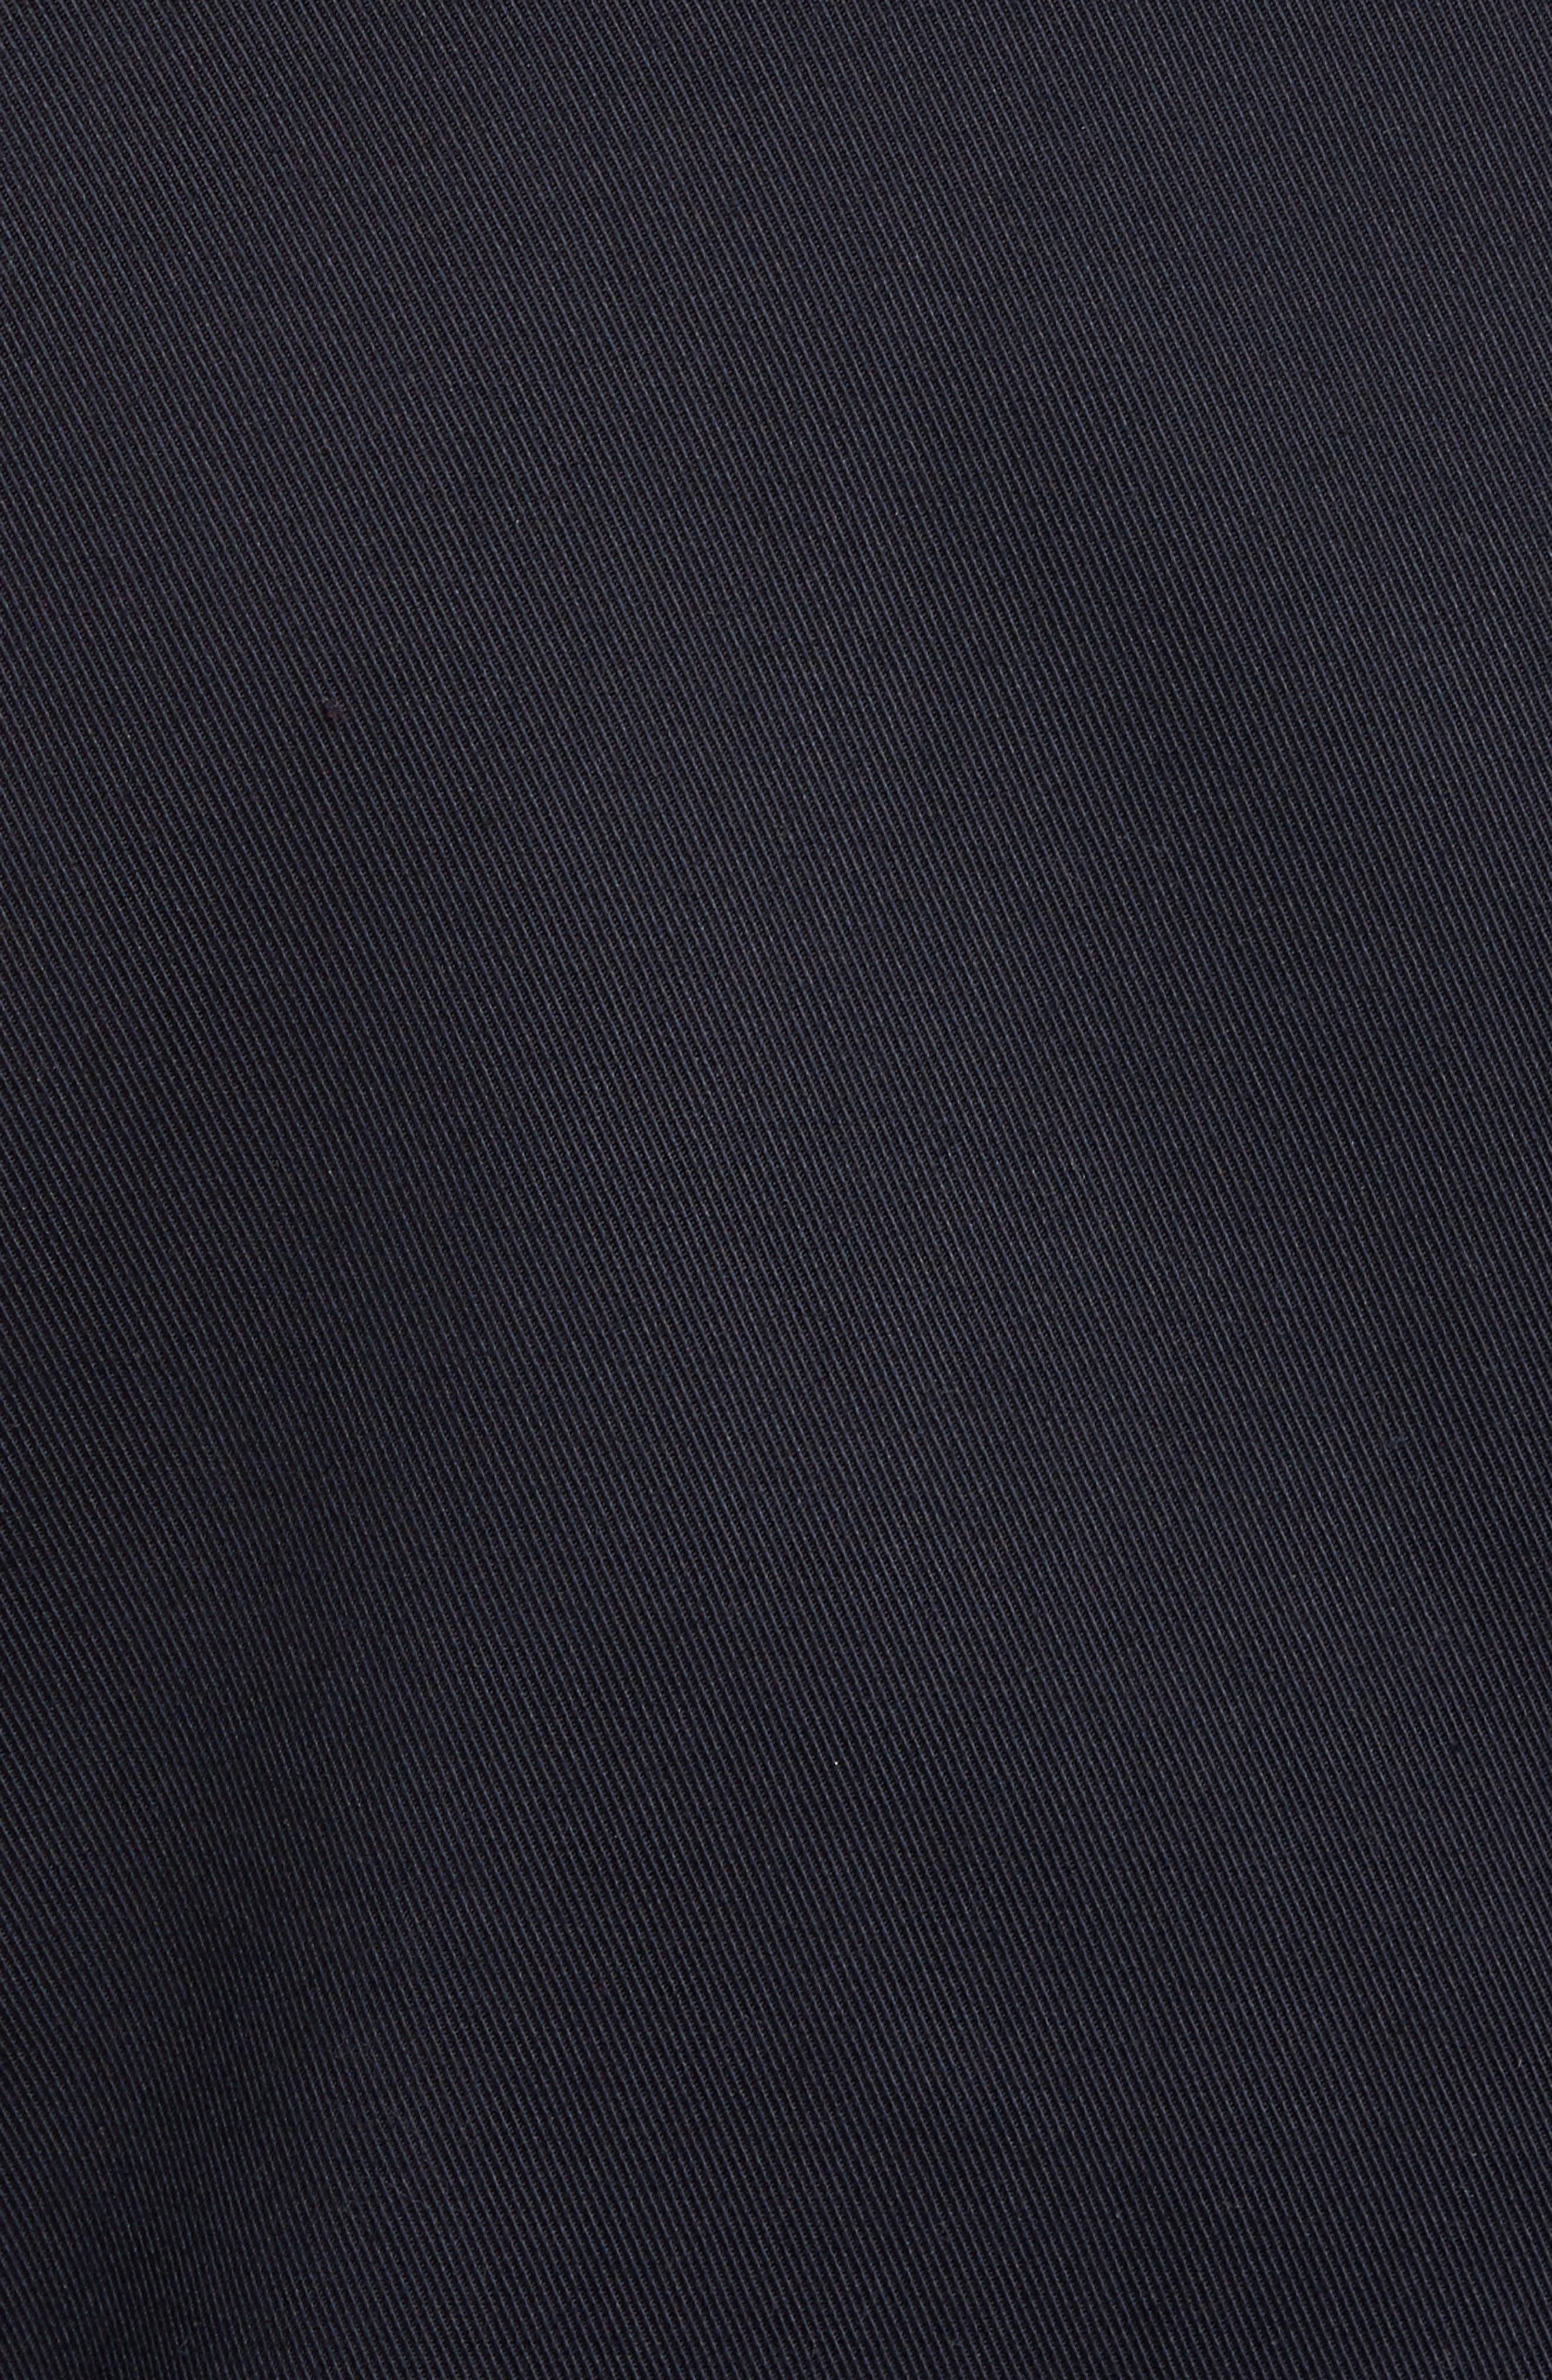 Alternate Image 5  - Nordstrom Men's Shop Grayson Stretch Cotton Blend Car Coat